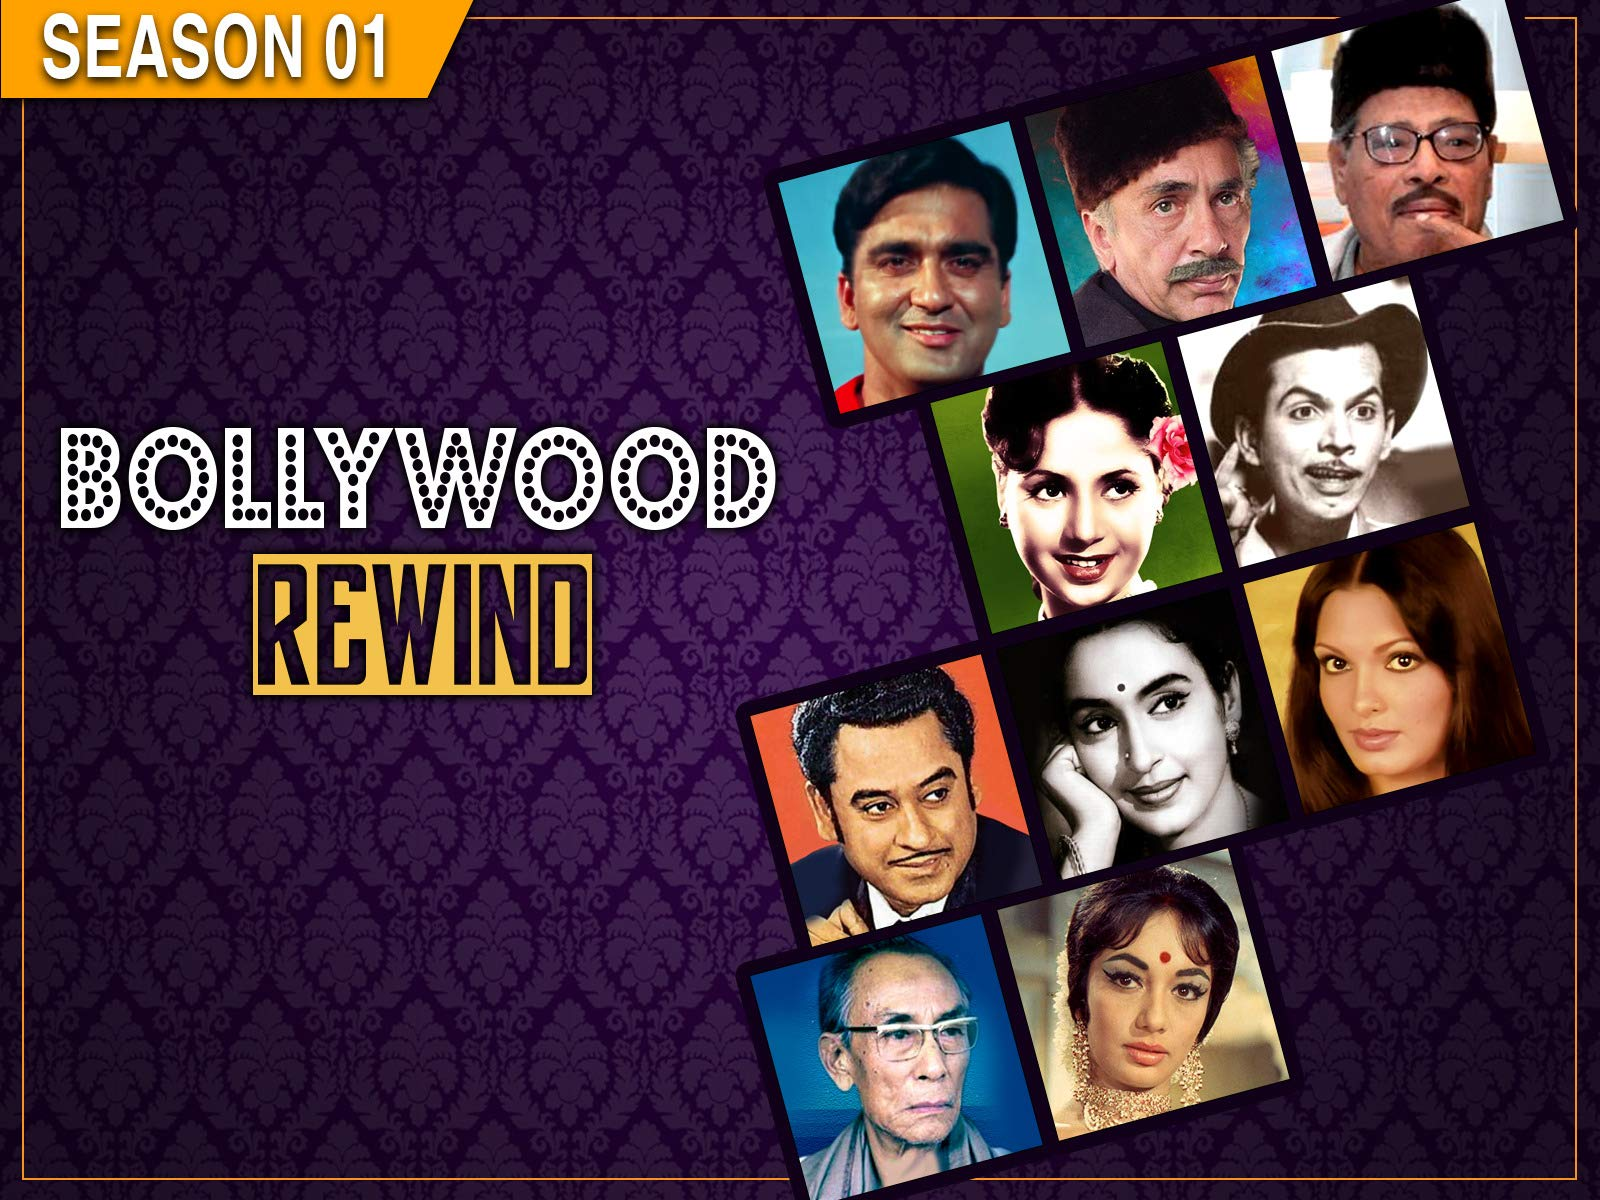 Clip: Bollywood Rewind - Biography & Facts - Season 1